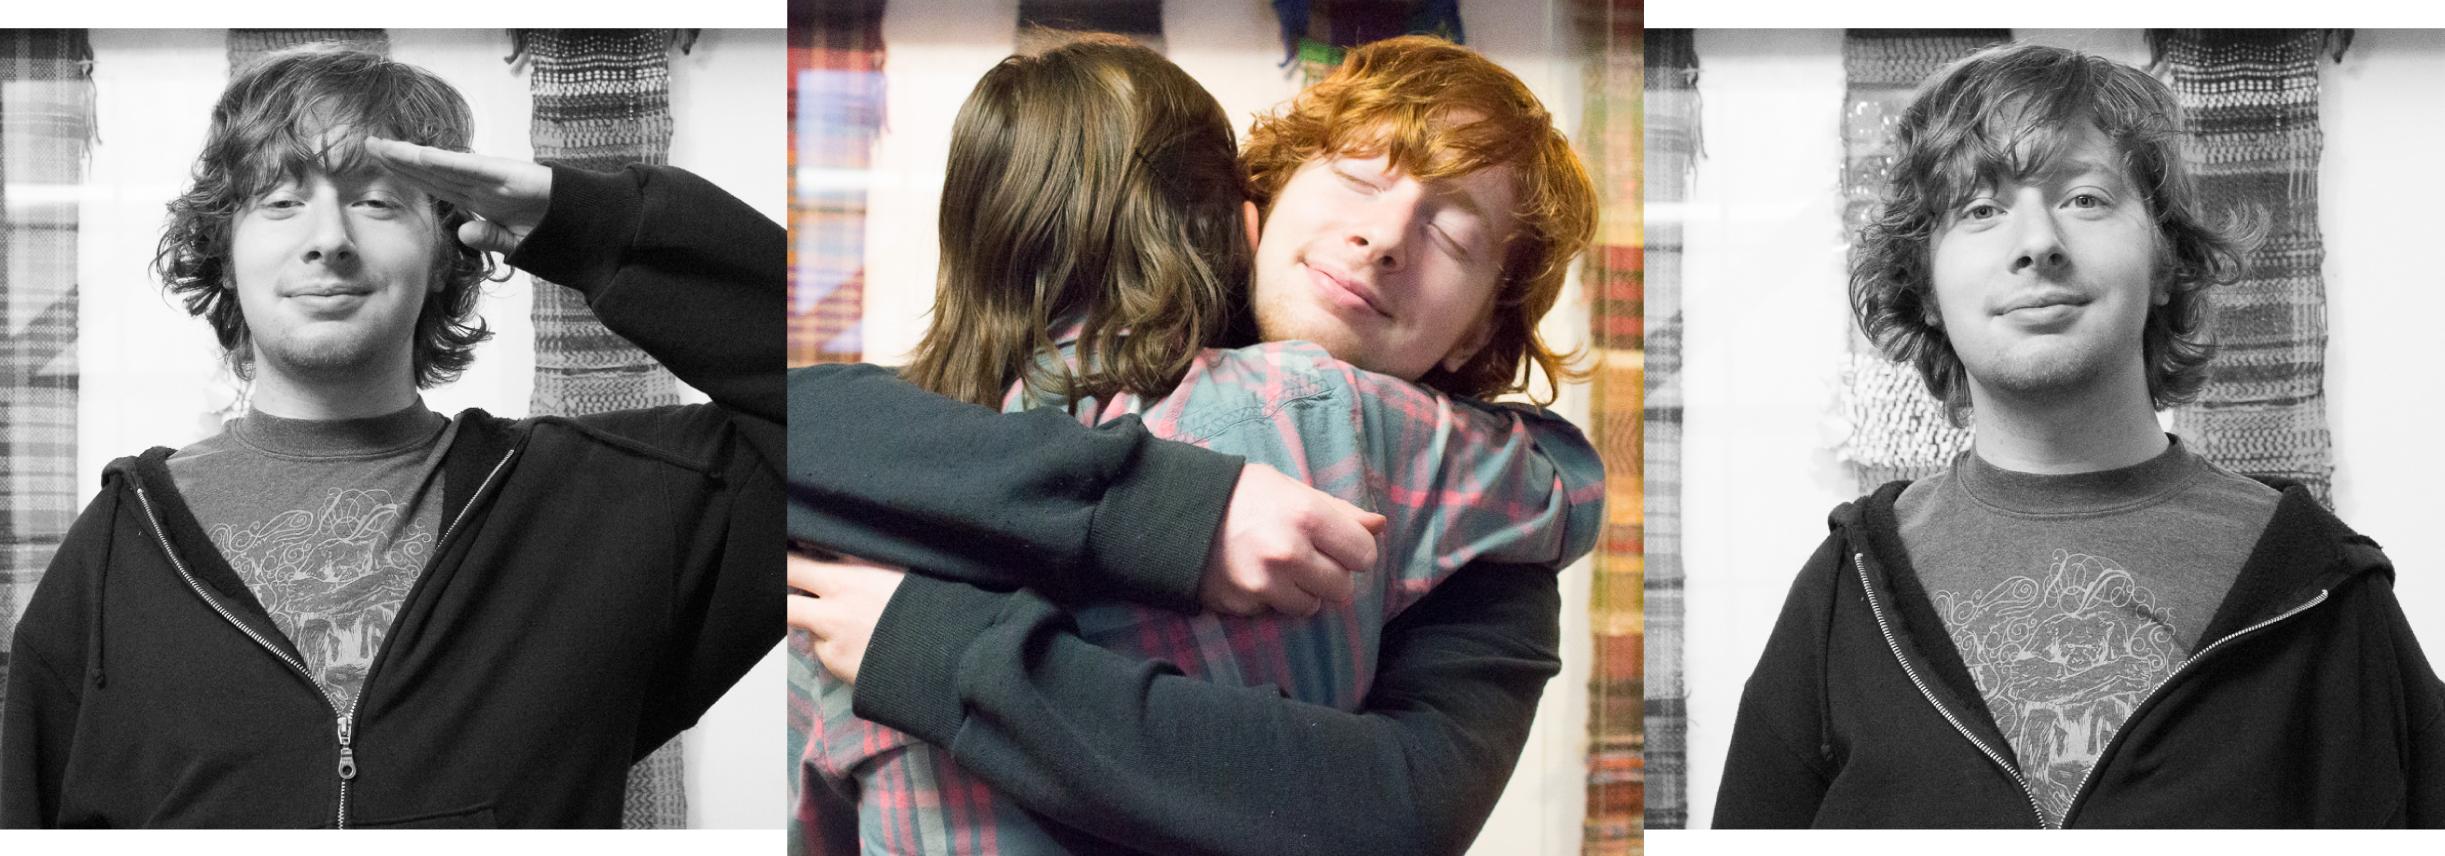 hugging-11